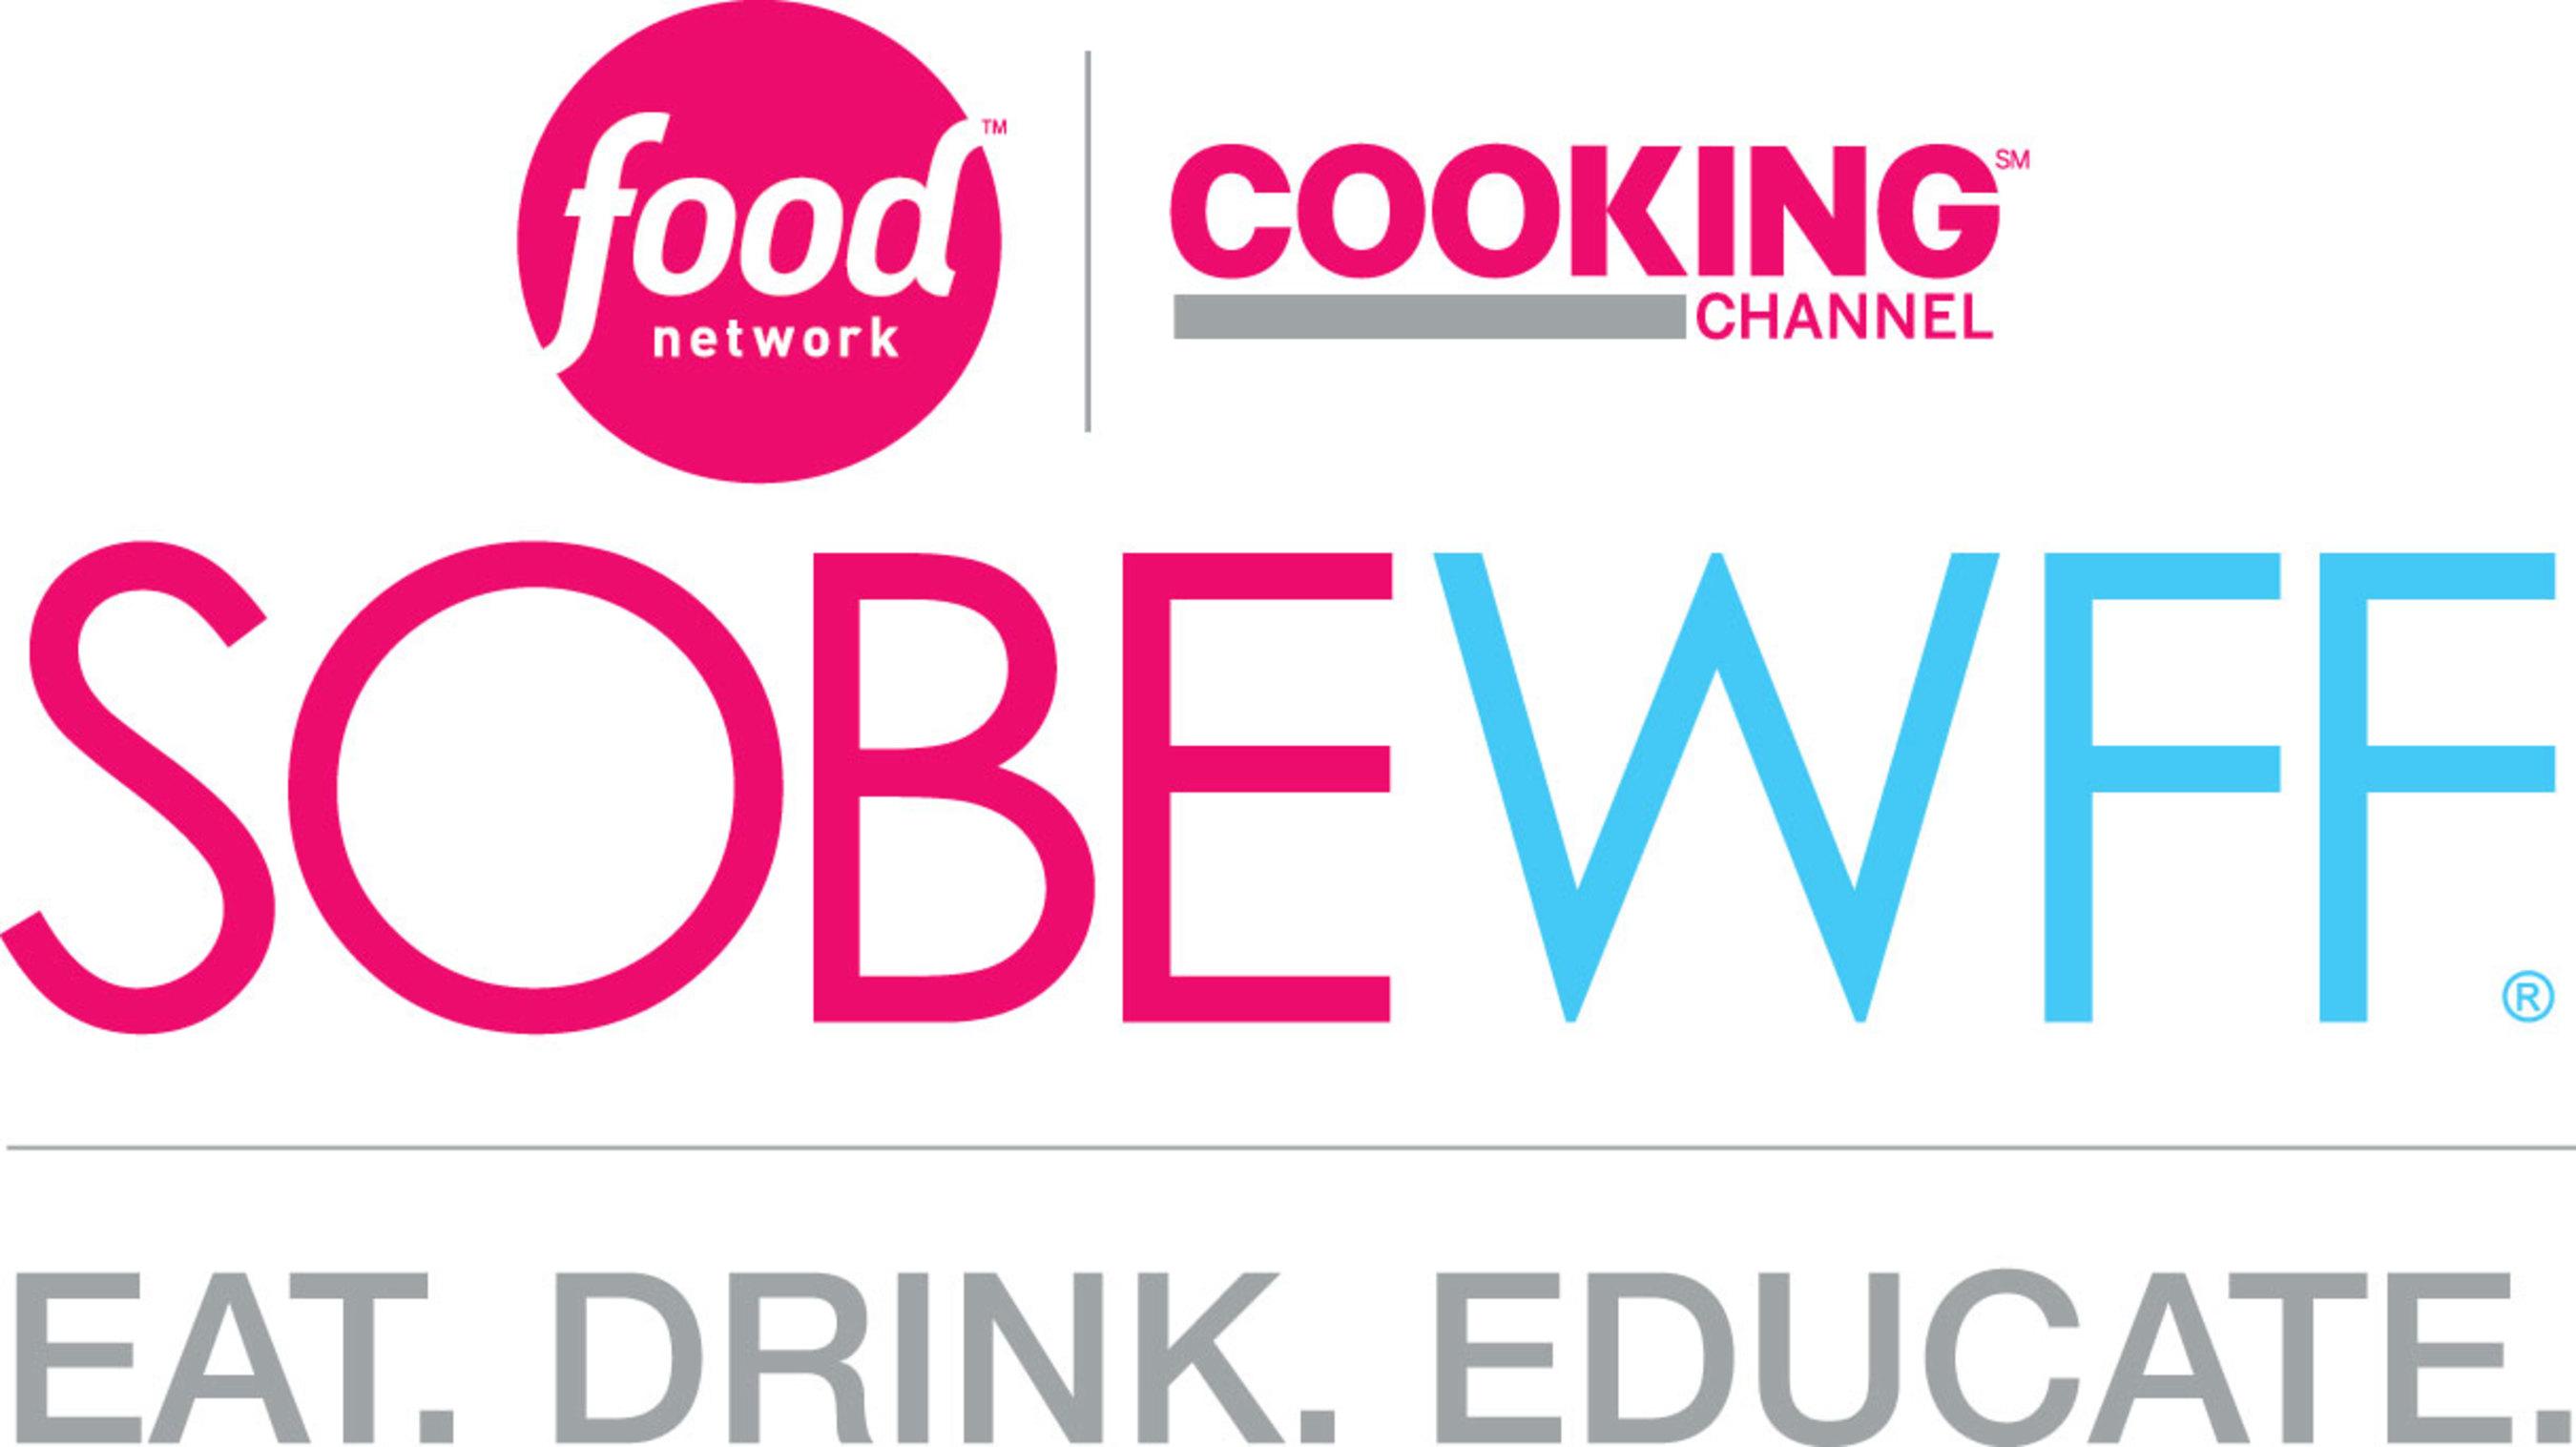 food network channel logo